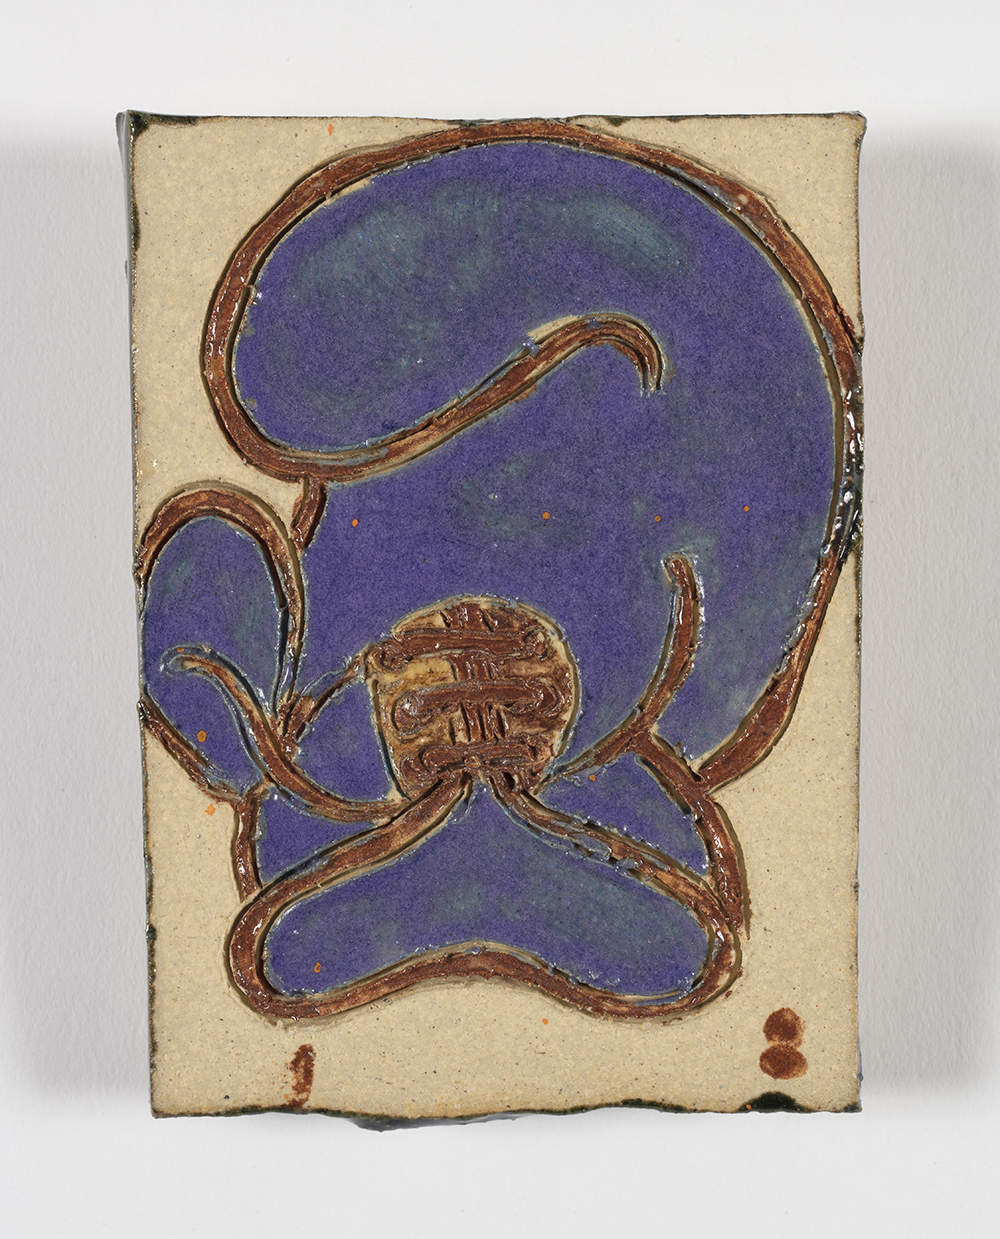 Kevin McNamee-Tweed.<em> Boxer</em>, 2019. Glazed ceramic, 4 x 2 1/4 inches (10.2 x 5.7 cm)